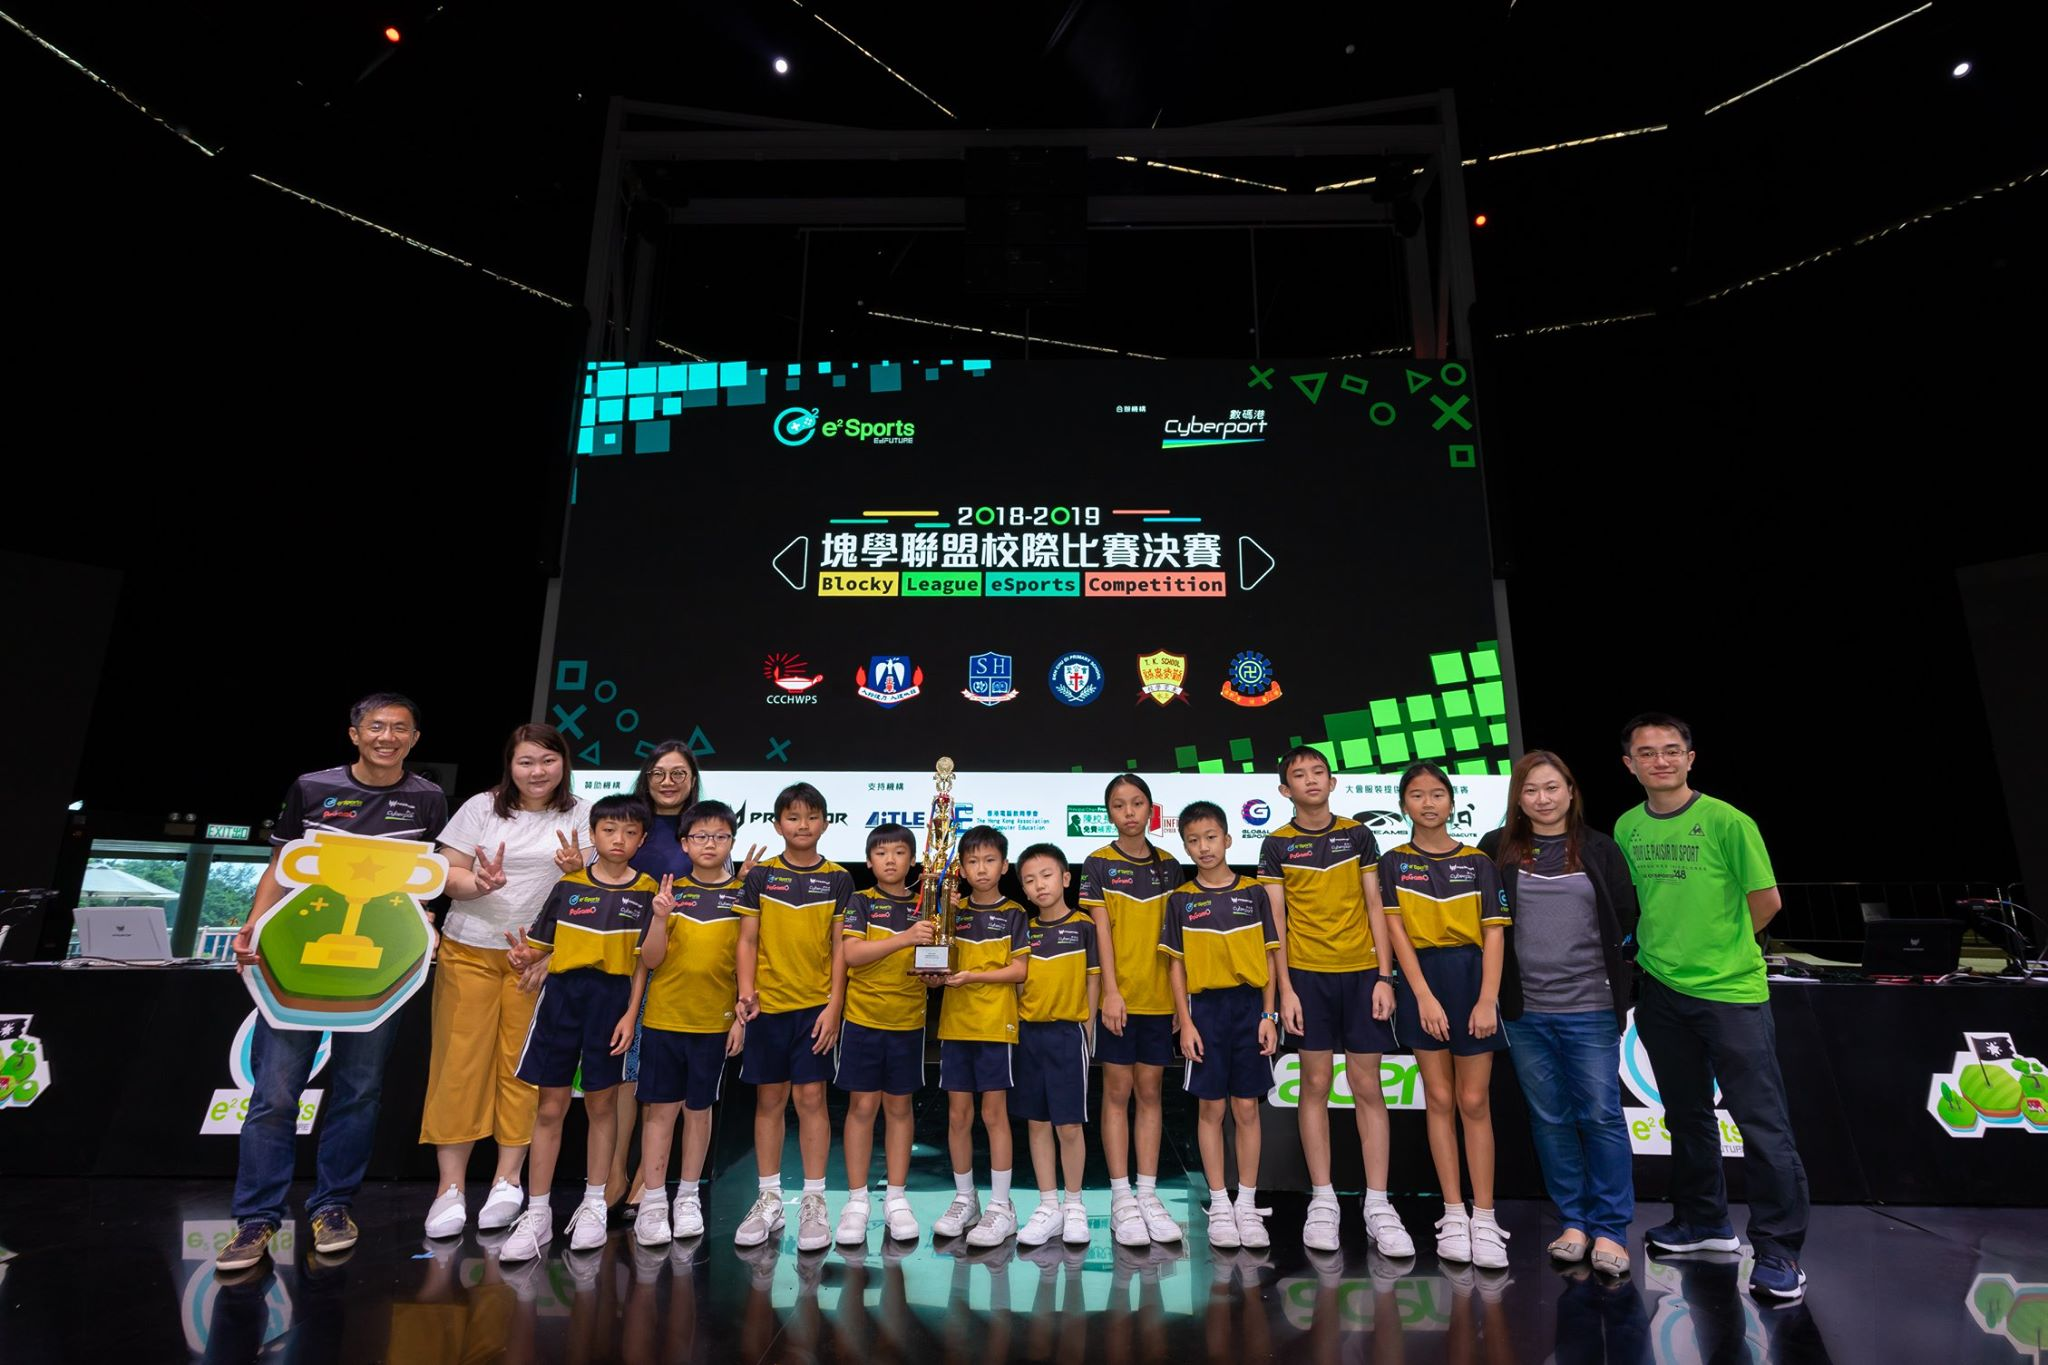 e.Kids STEM 2018-2019 e²Sports《塊學聯盟》校際比賽決賽